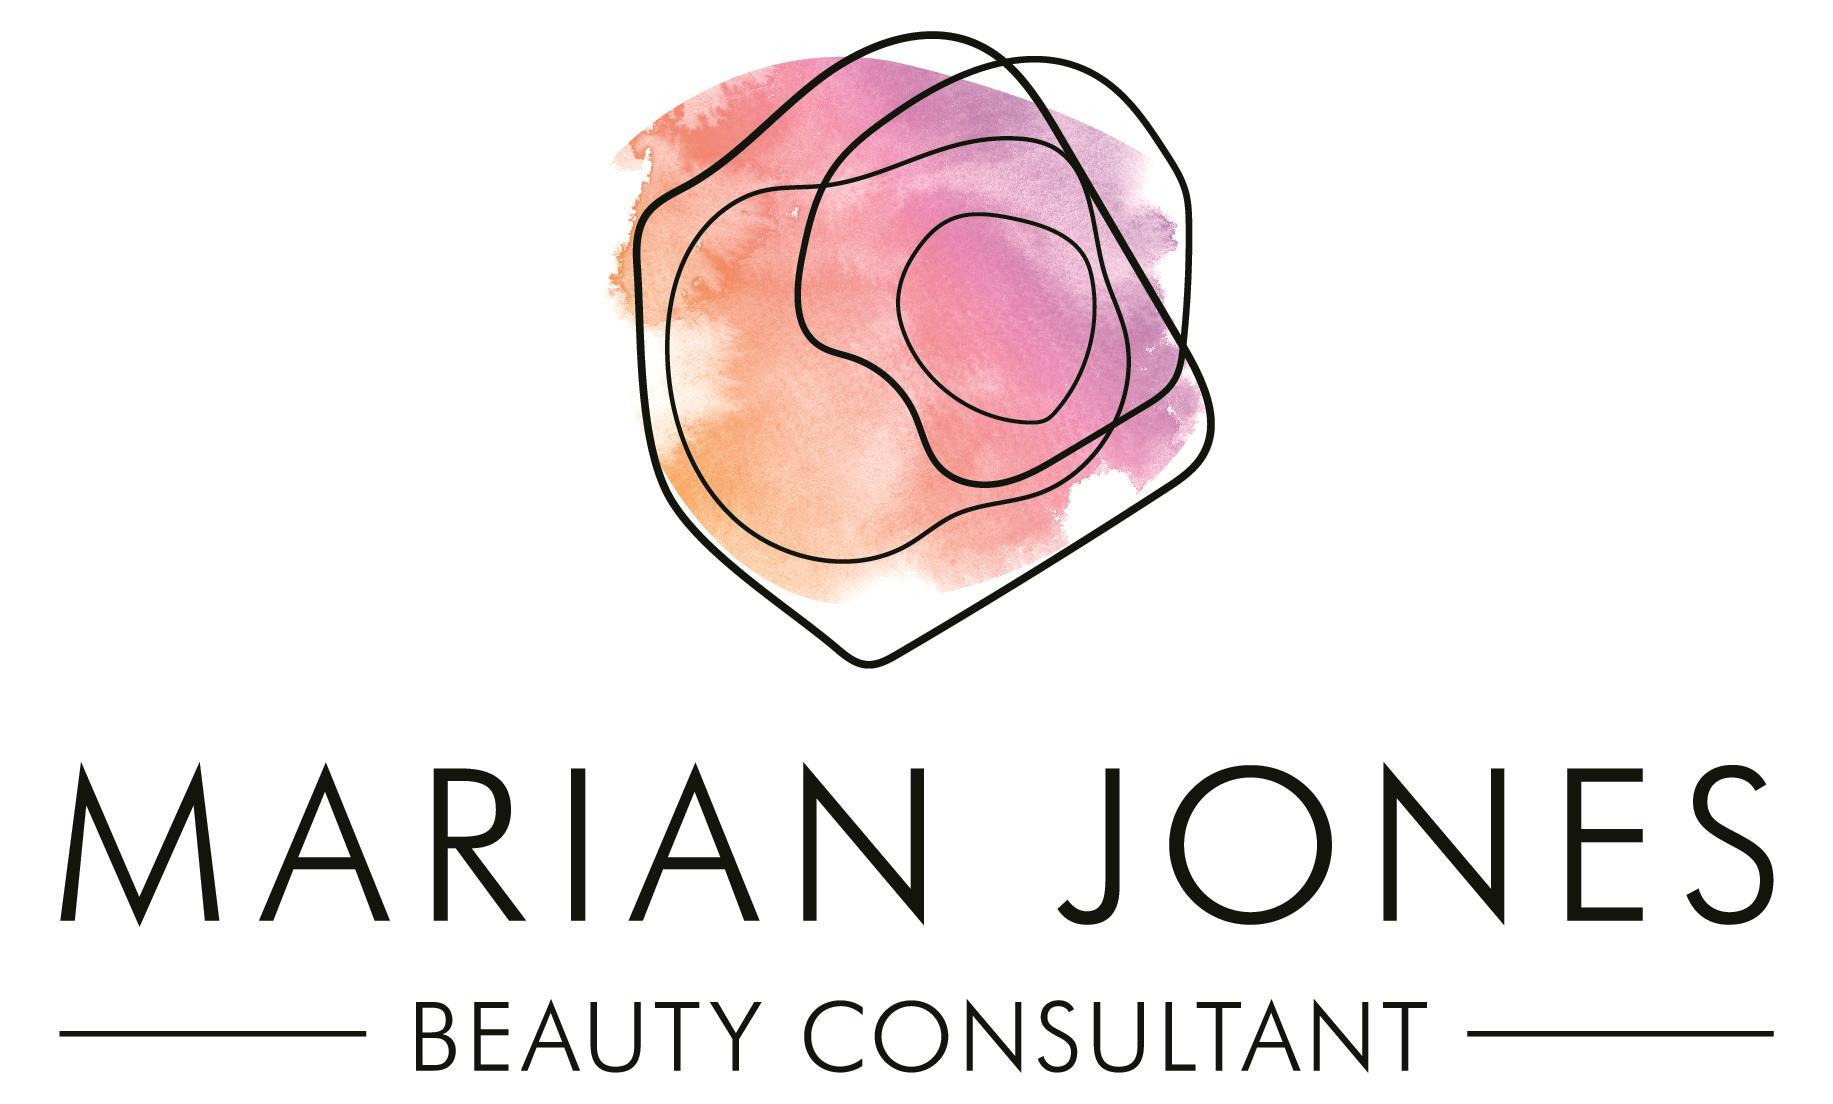 Marian Jones beauty